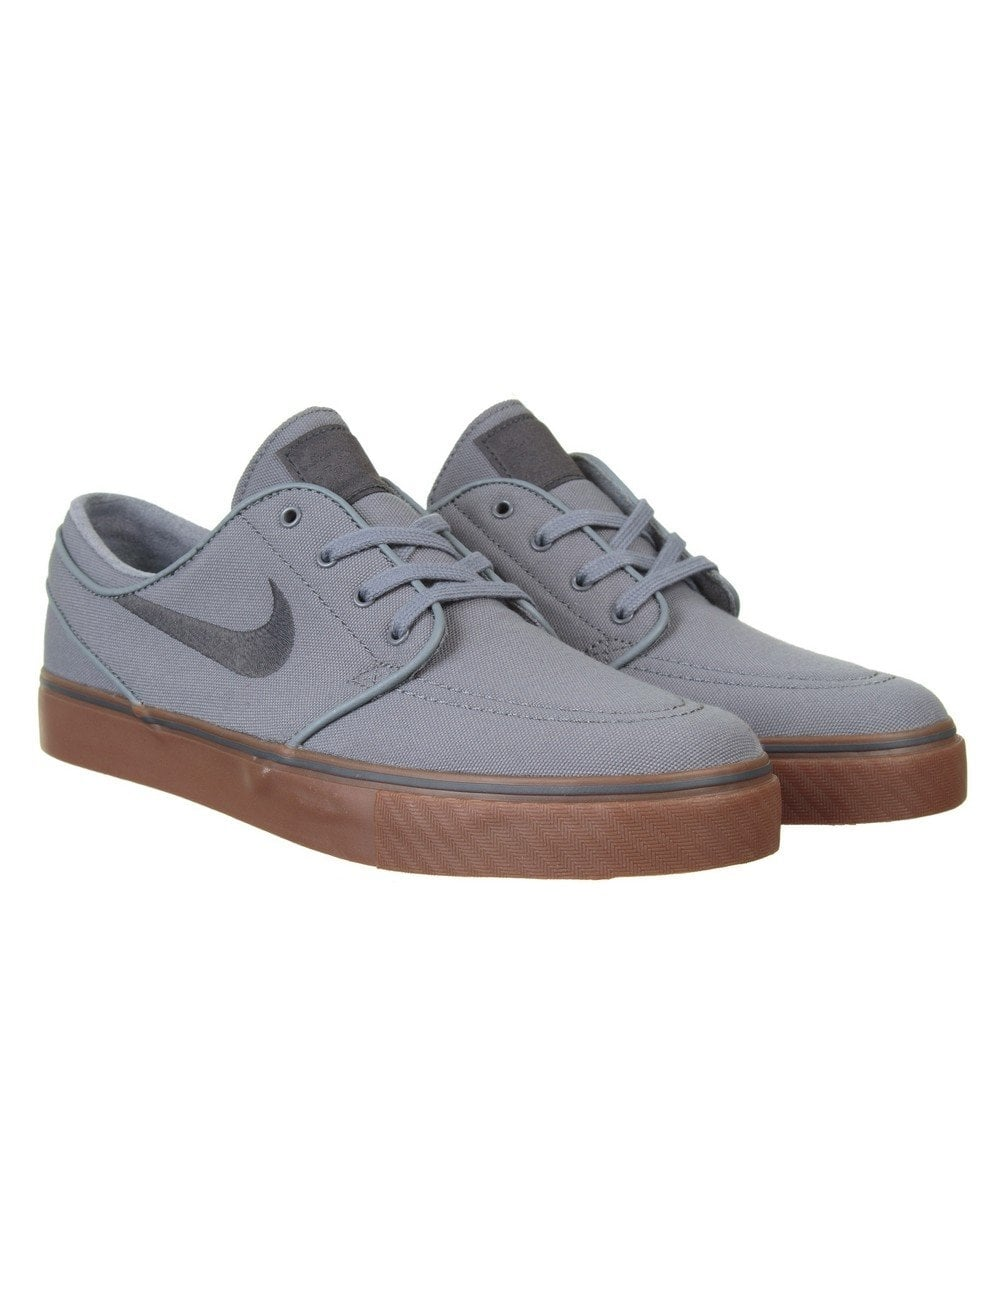 Nike SB Stefan Janoski Shoes - Cool Grey Gum Sole - Footwear from ... cf9a2bfd8116